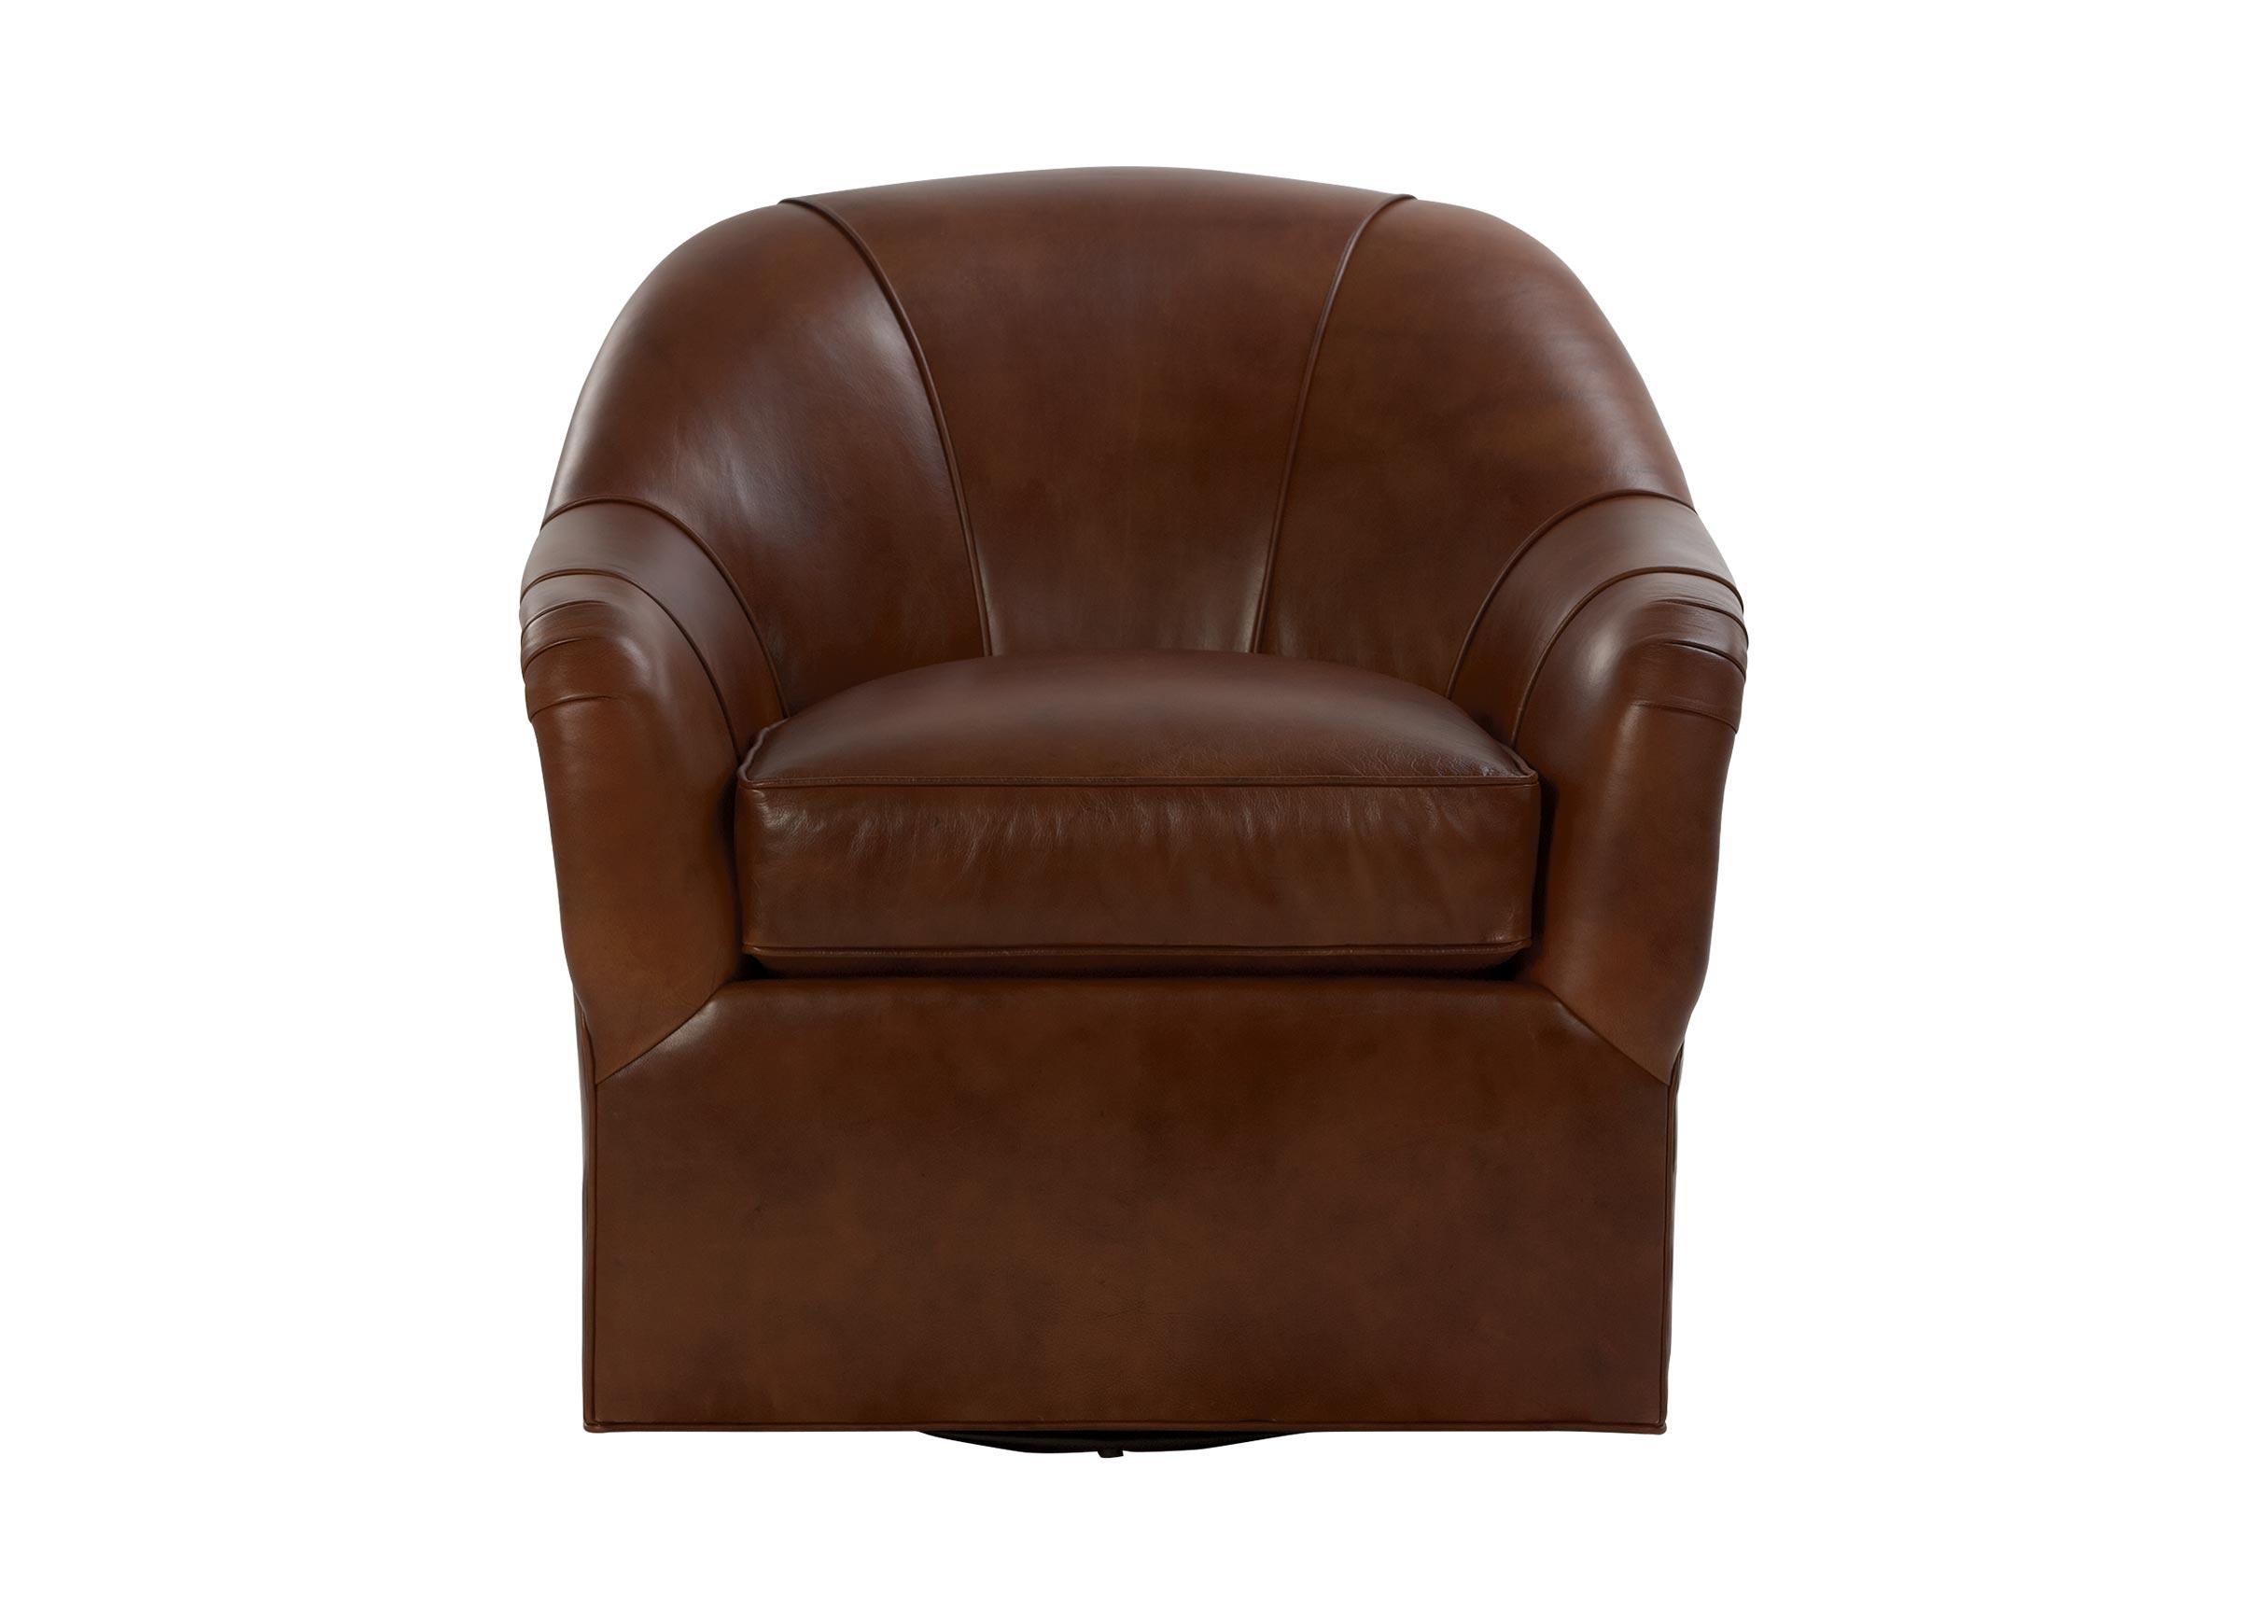 Marino Swivel Leather Chair  Chairs  Chaises